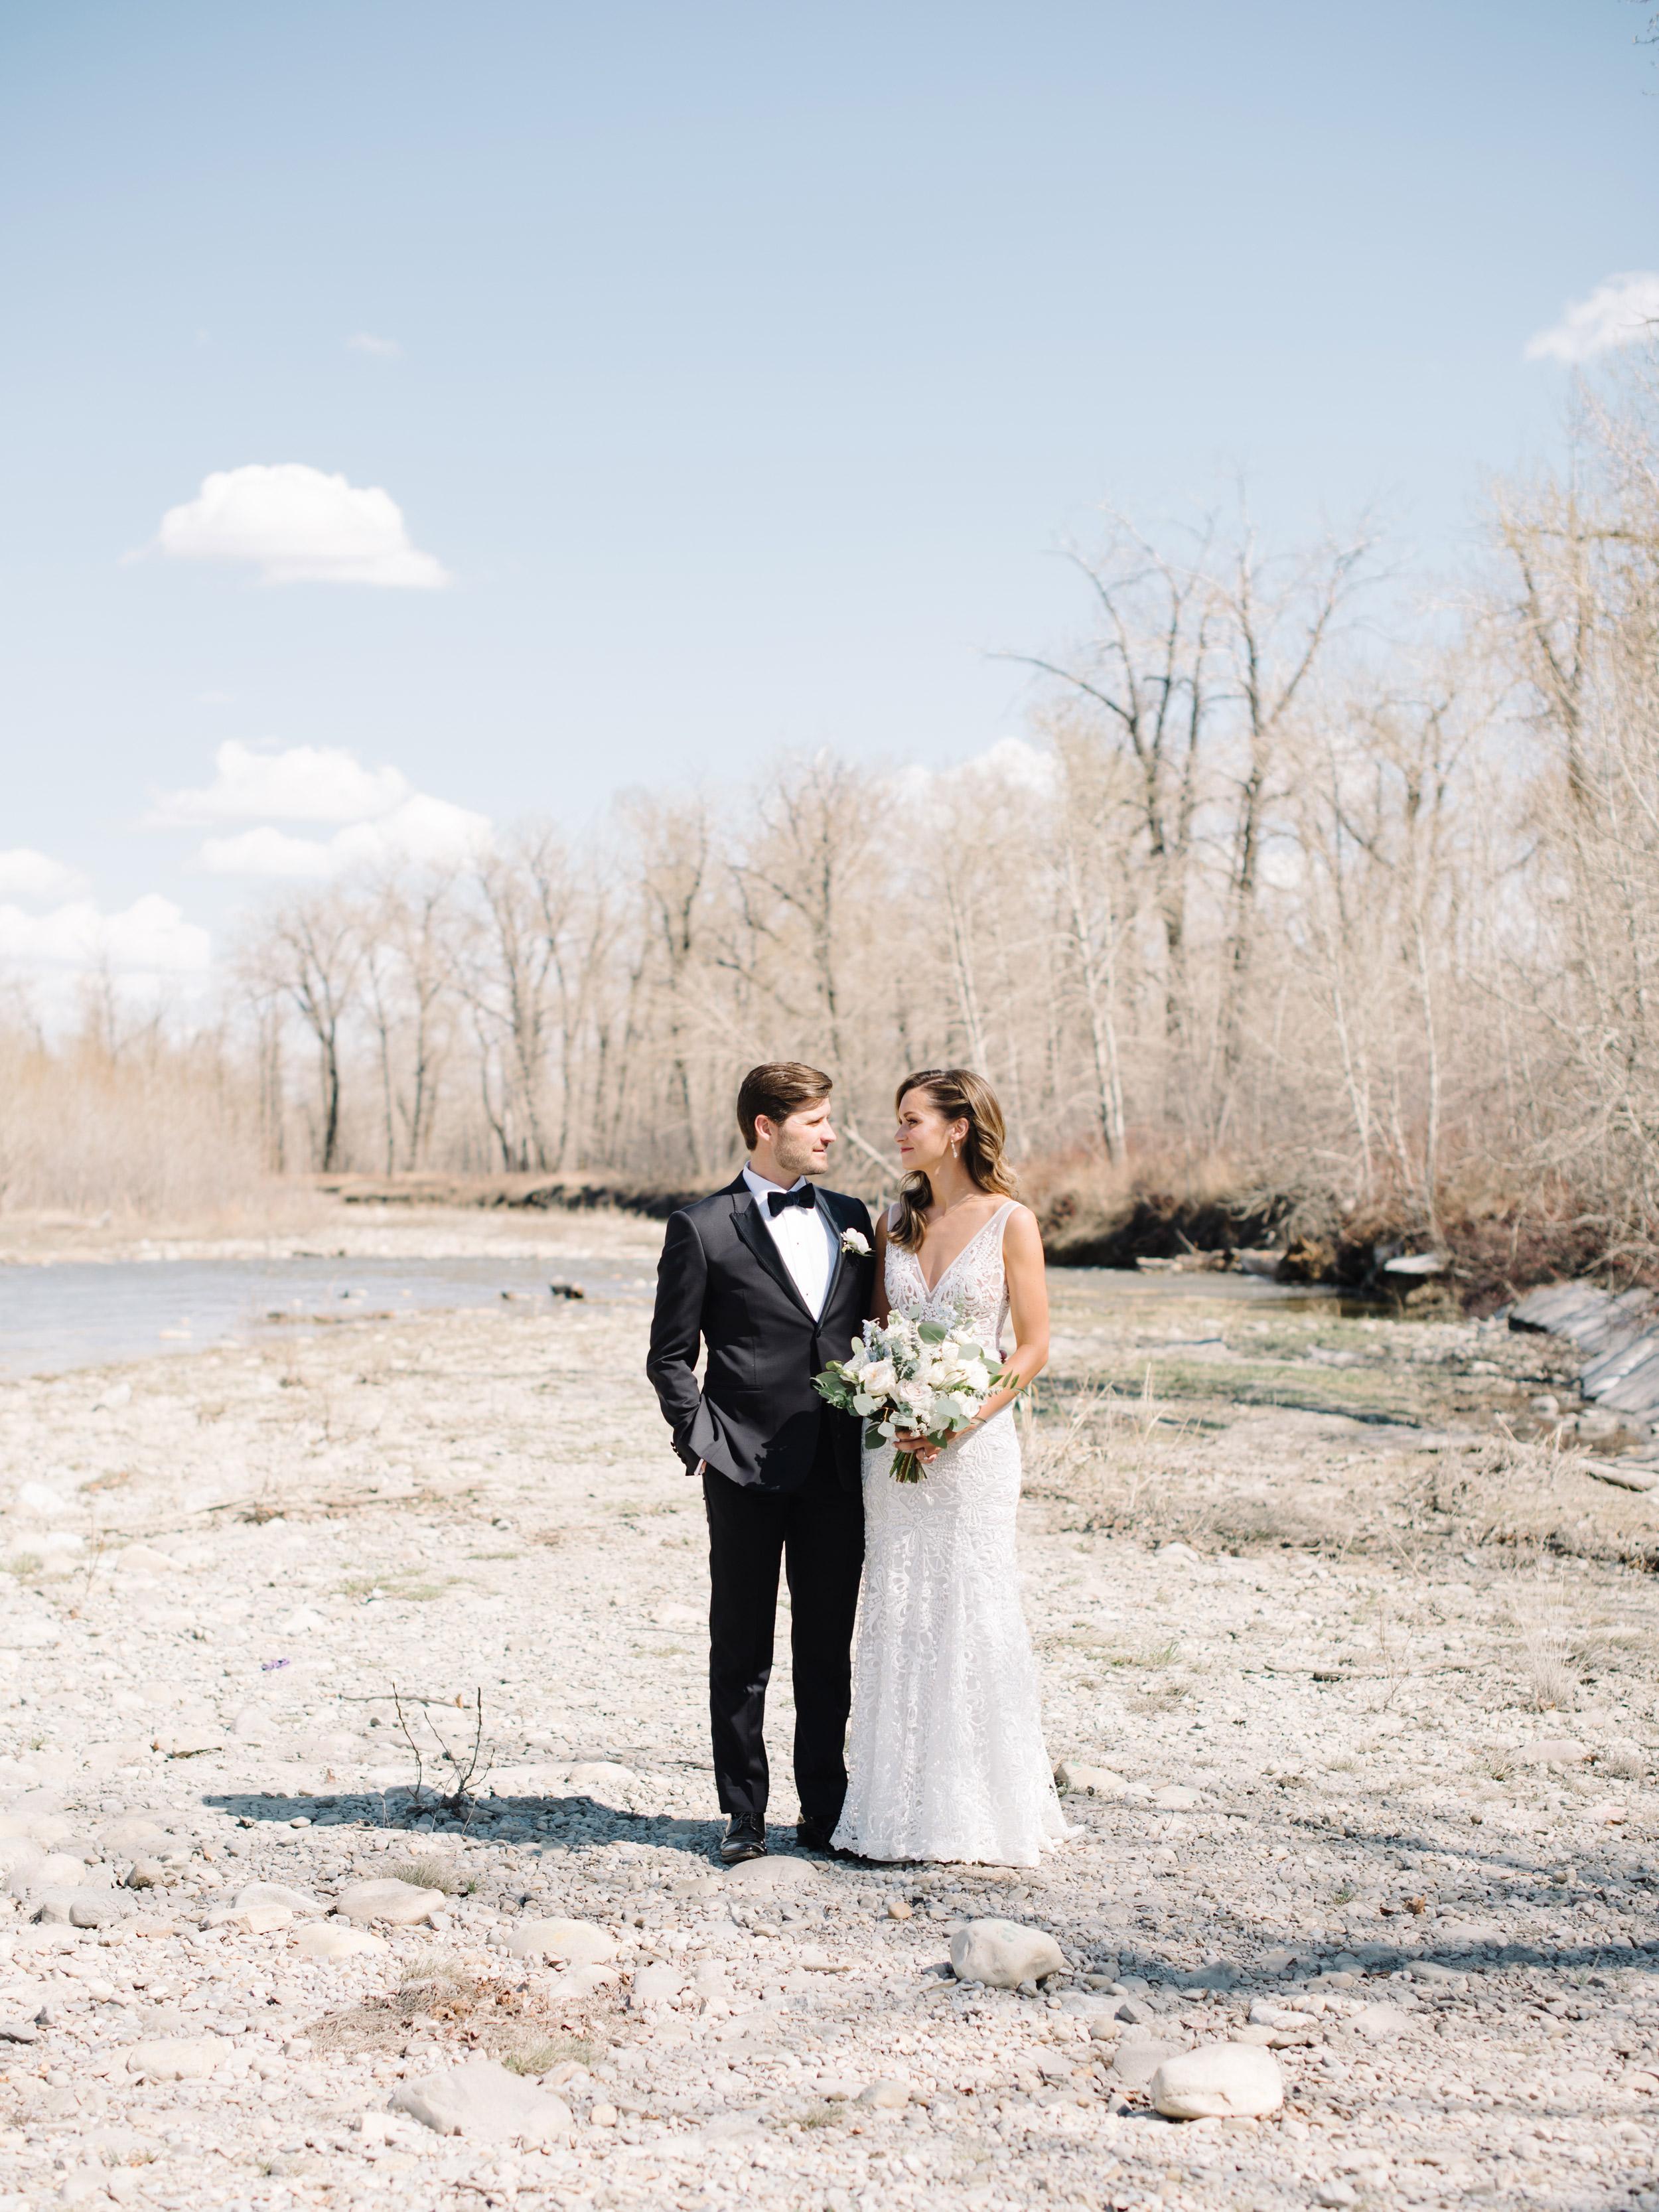 106-The_Lake_House_Calgary_Wedding.jpg